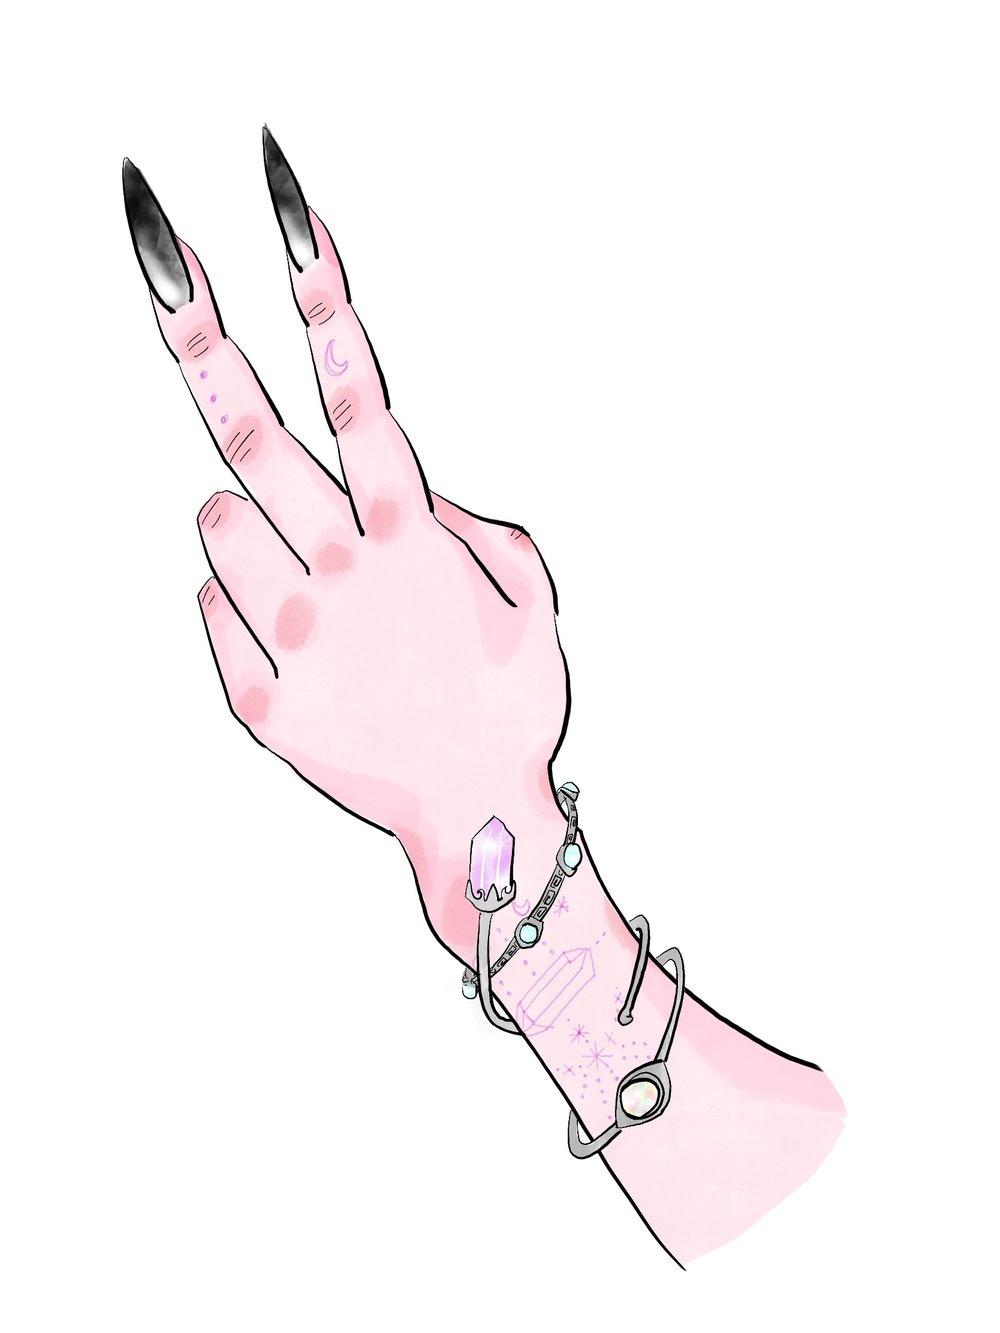 lo & chlo wrist